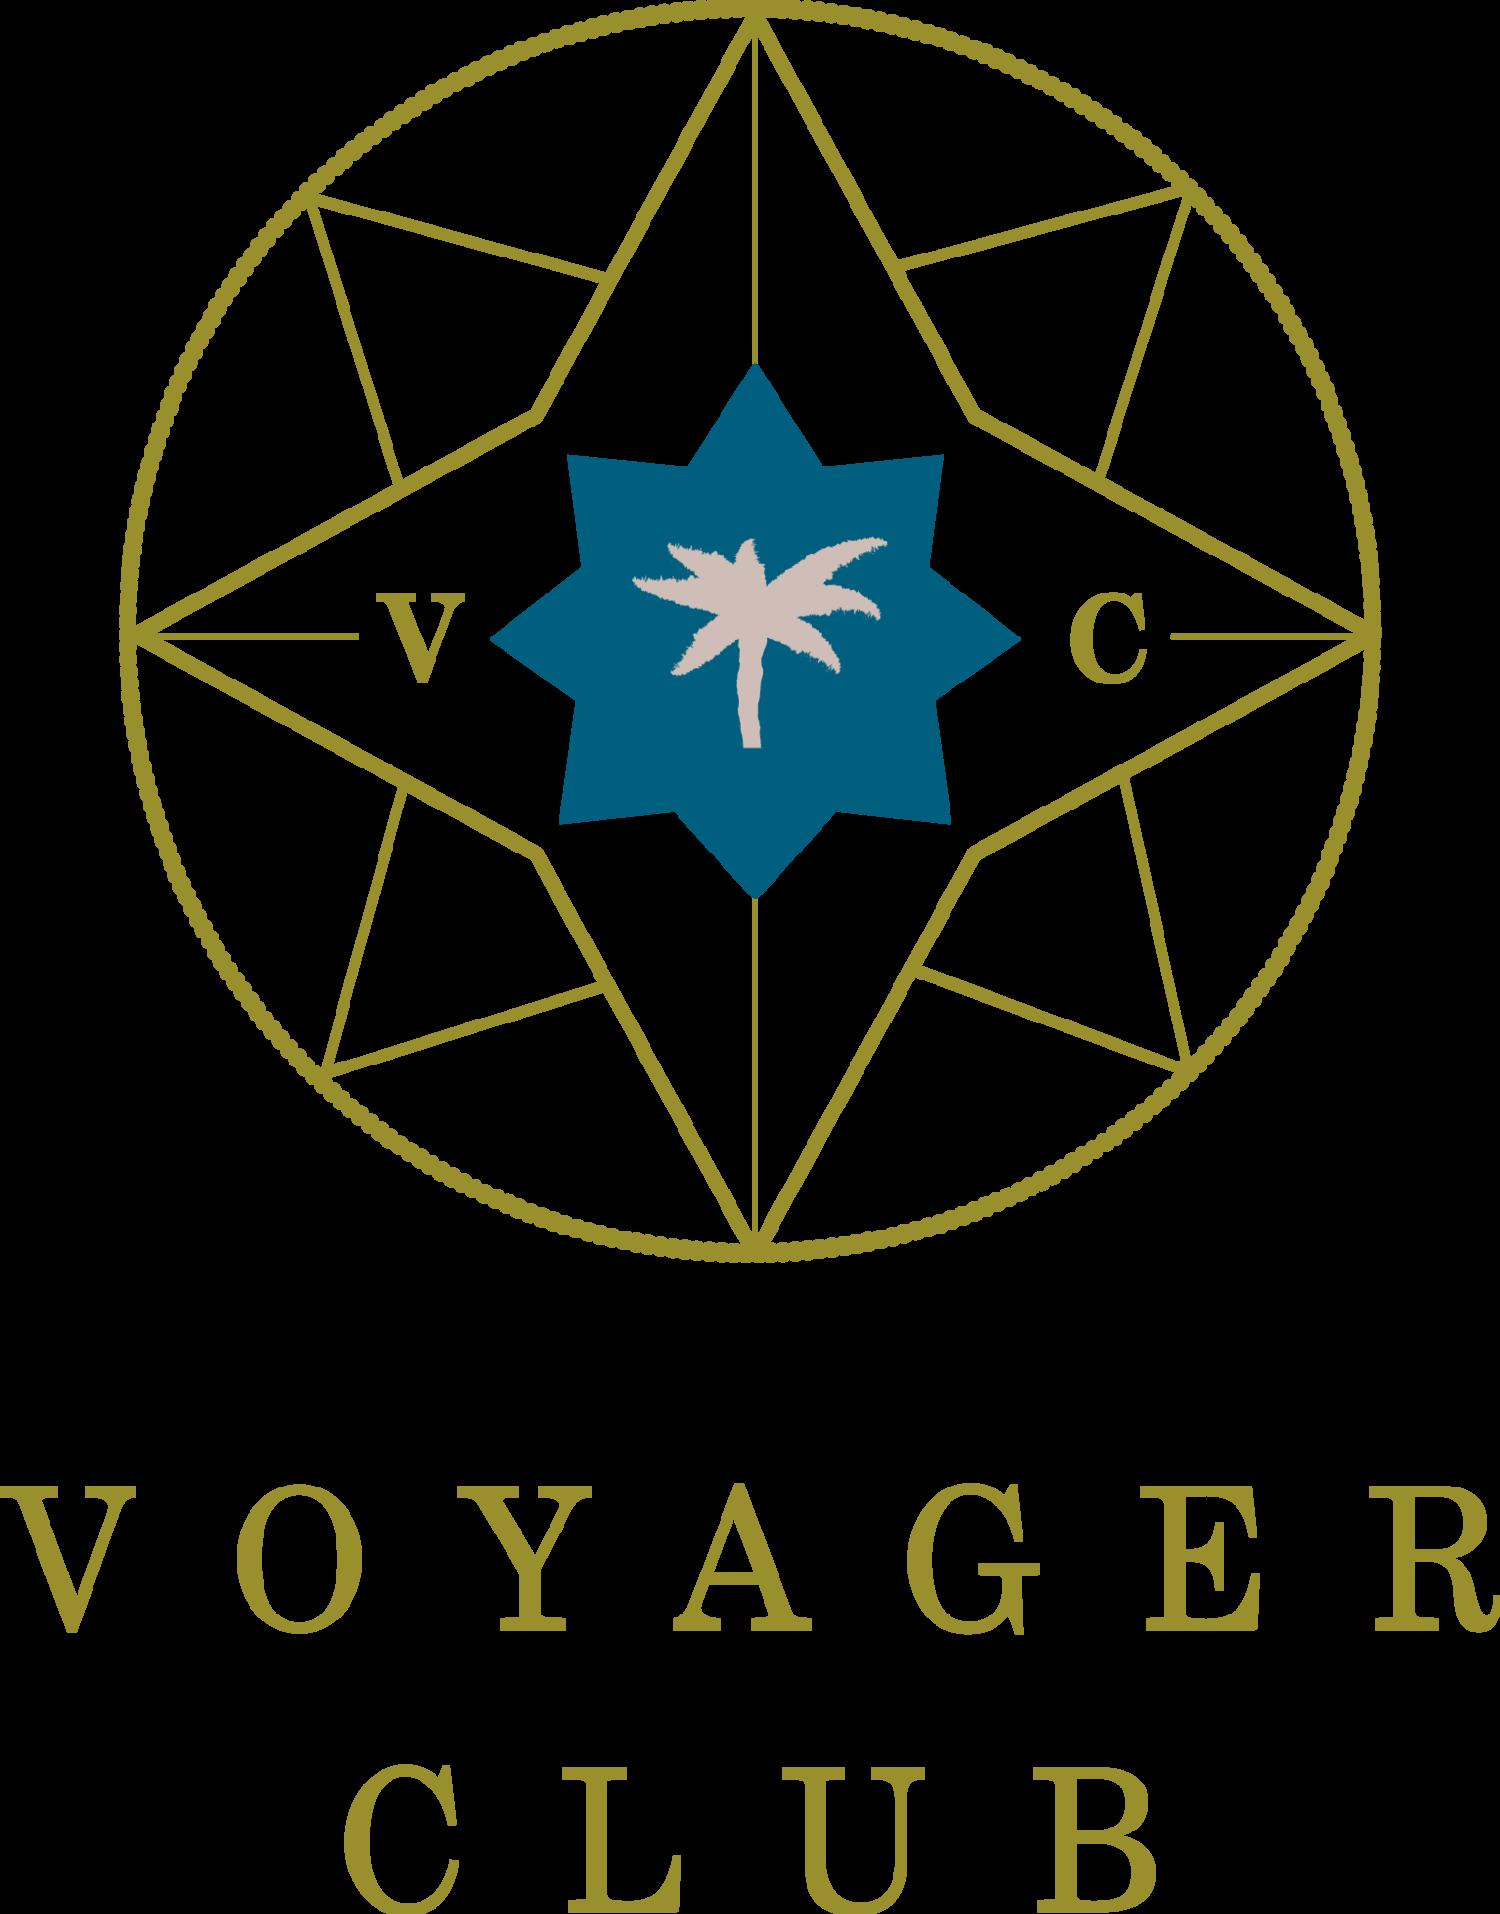 Voyager+club logo